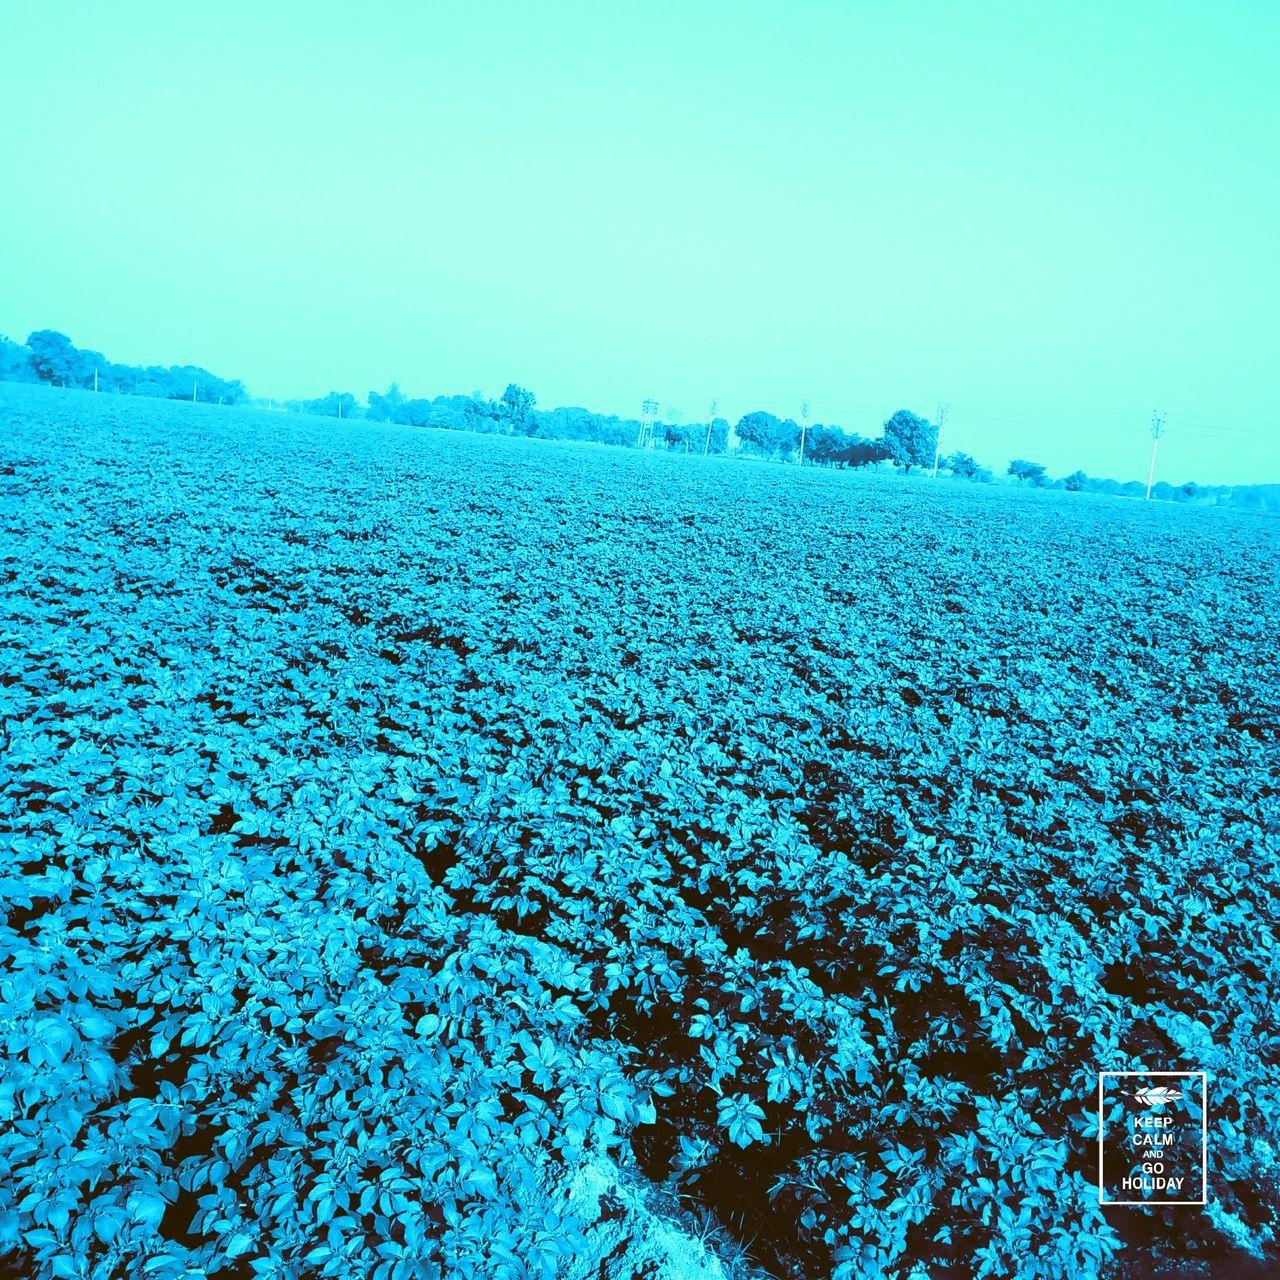 Field of potato EyeEmNewHere